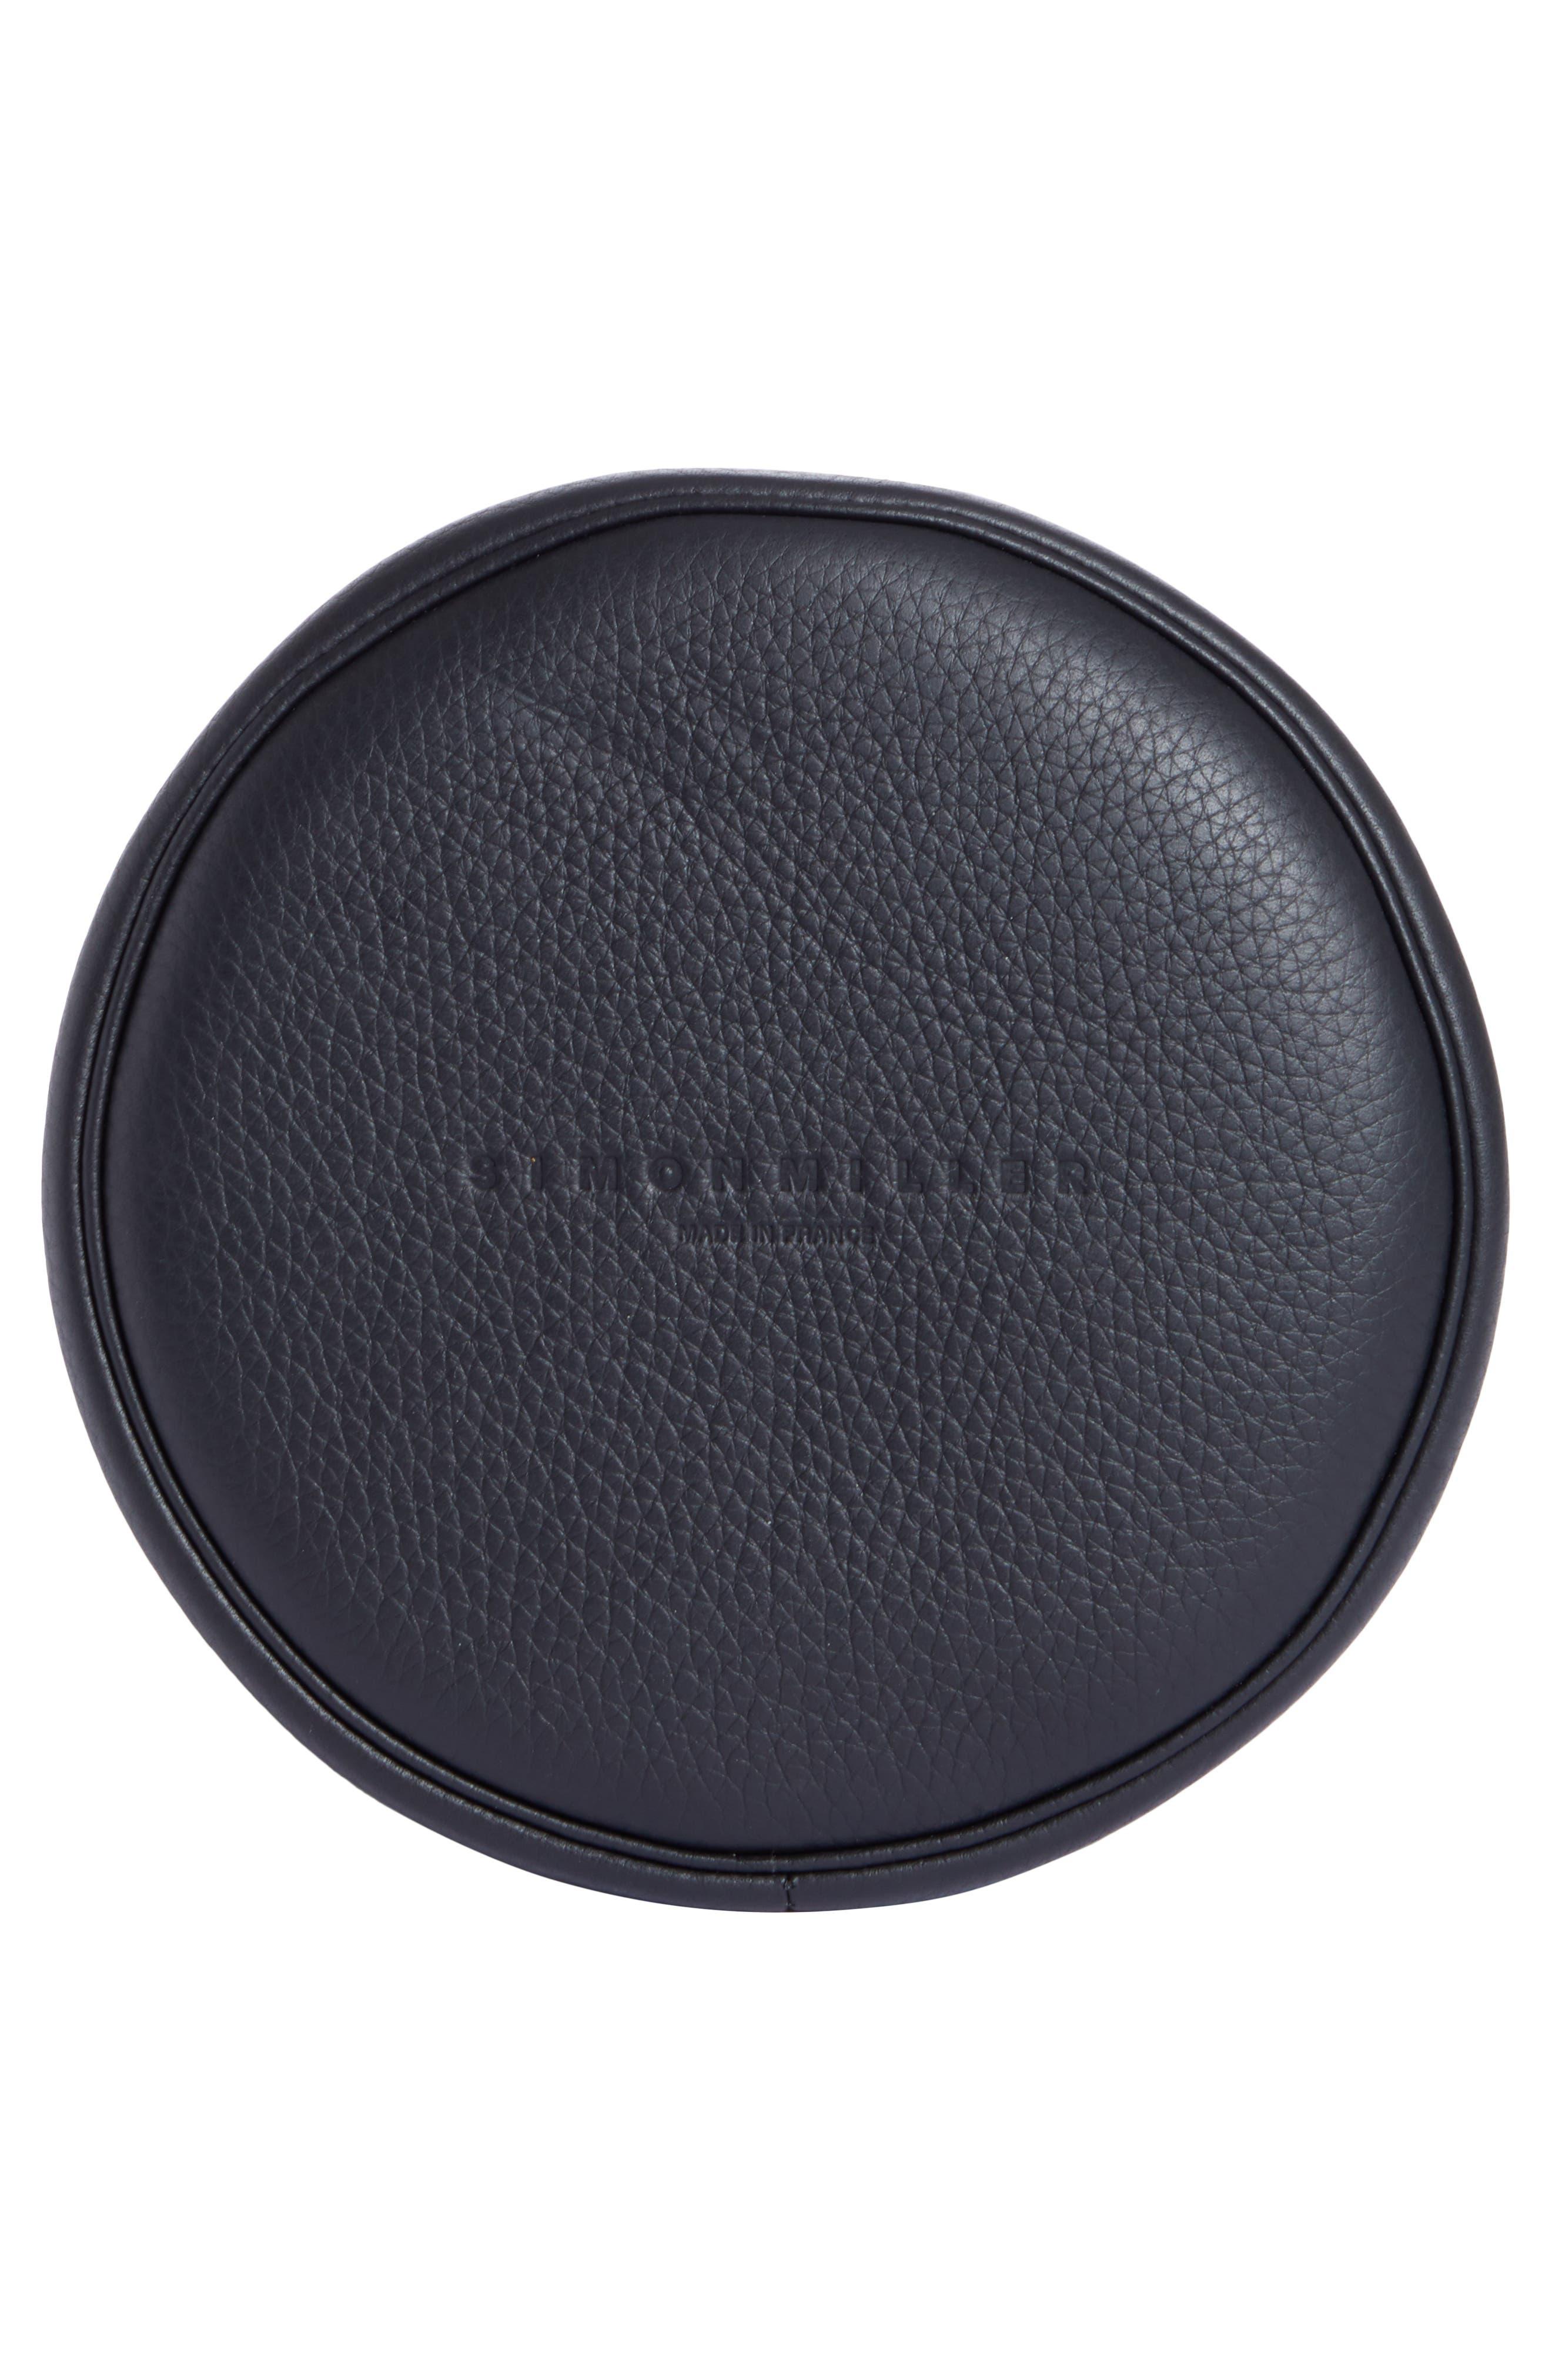 Bonsai 20 Pebbled Leather Bucket Bag,                             Alternate thumbnail 6, color,                             001